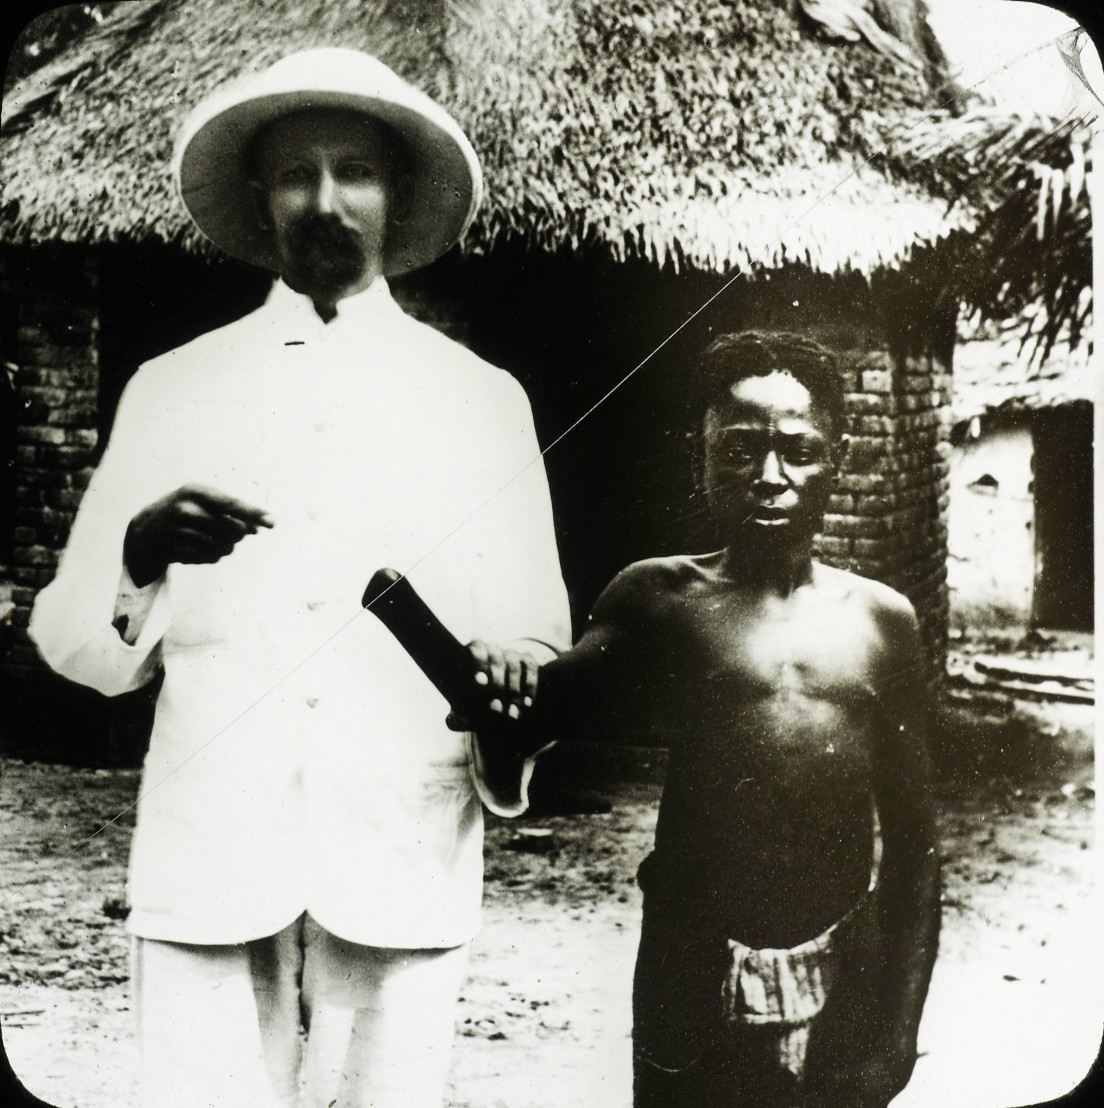 Victim_of_Congo_atrocities,_Congo,_ca._1890-1910_(IMP-CSCNWW33-OS10-19)